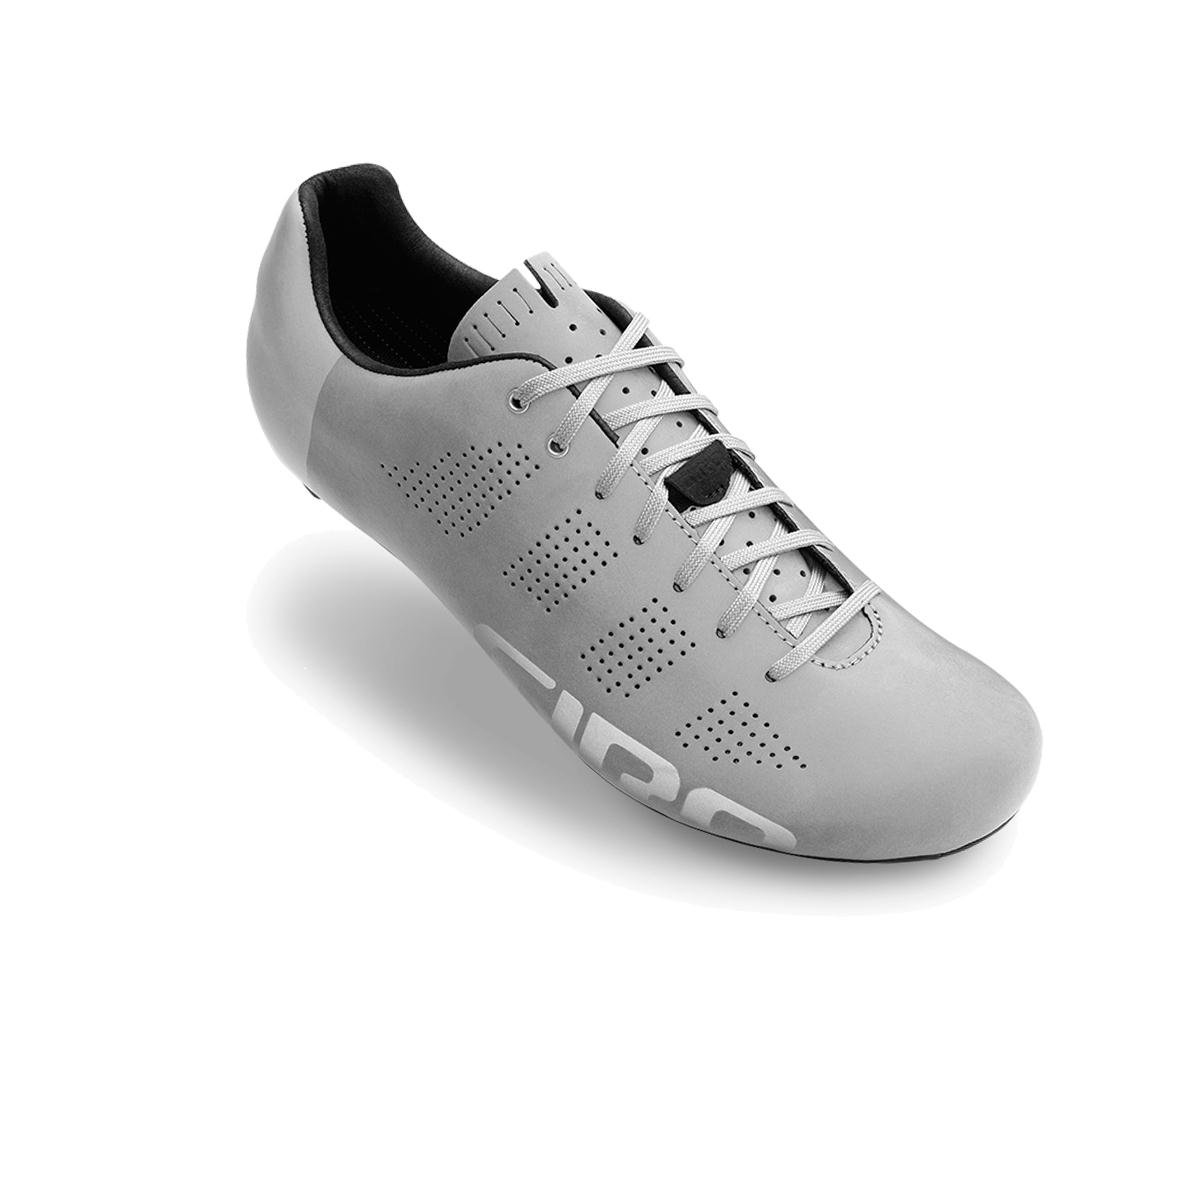 Giro Empire ACC Road Cycling Shoes B00NB0IARQ 45|Silver Reflective